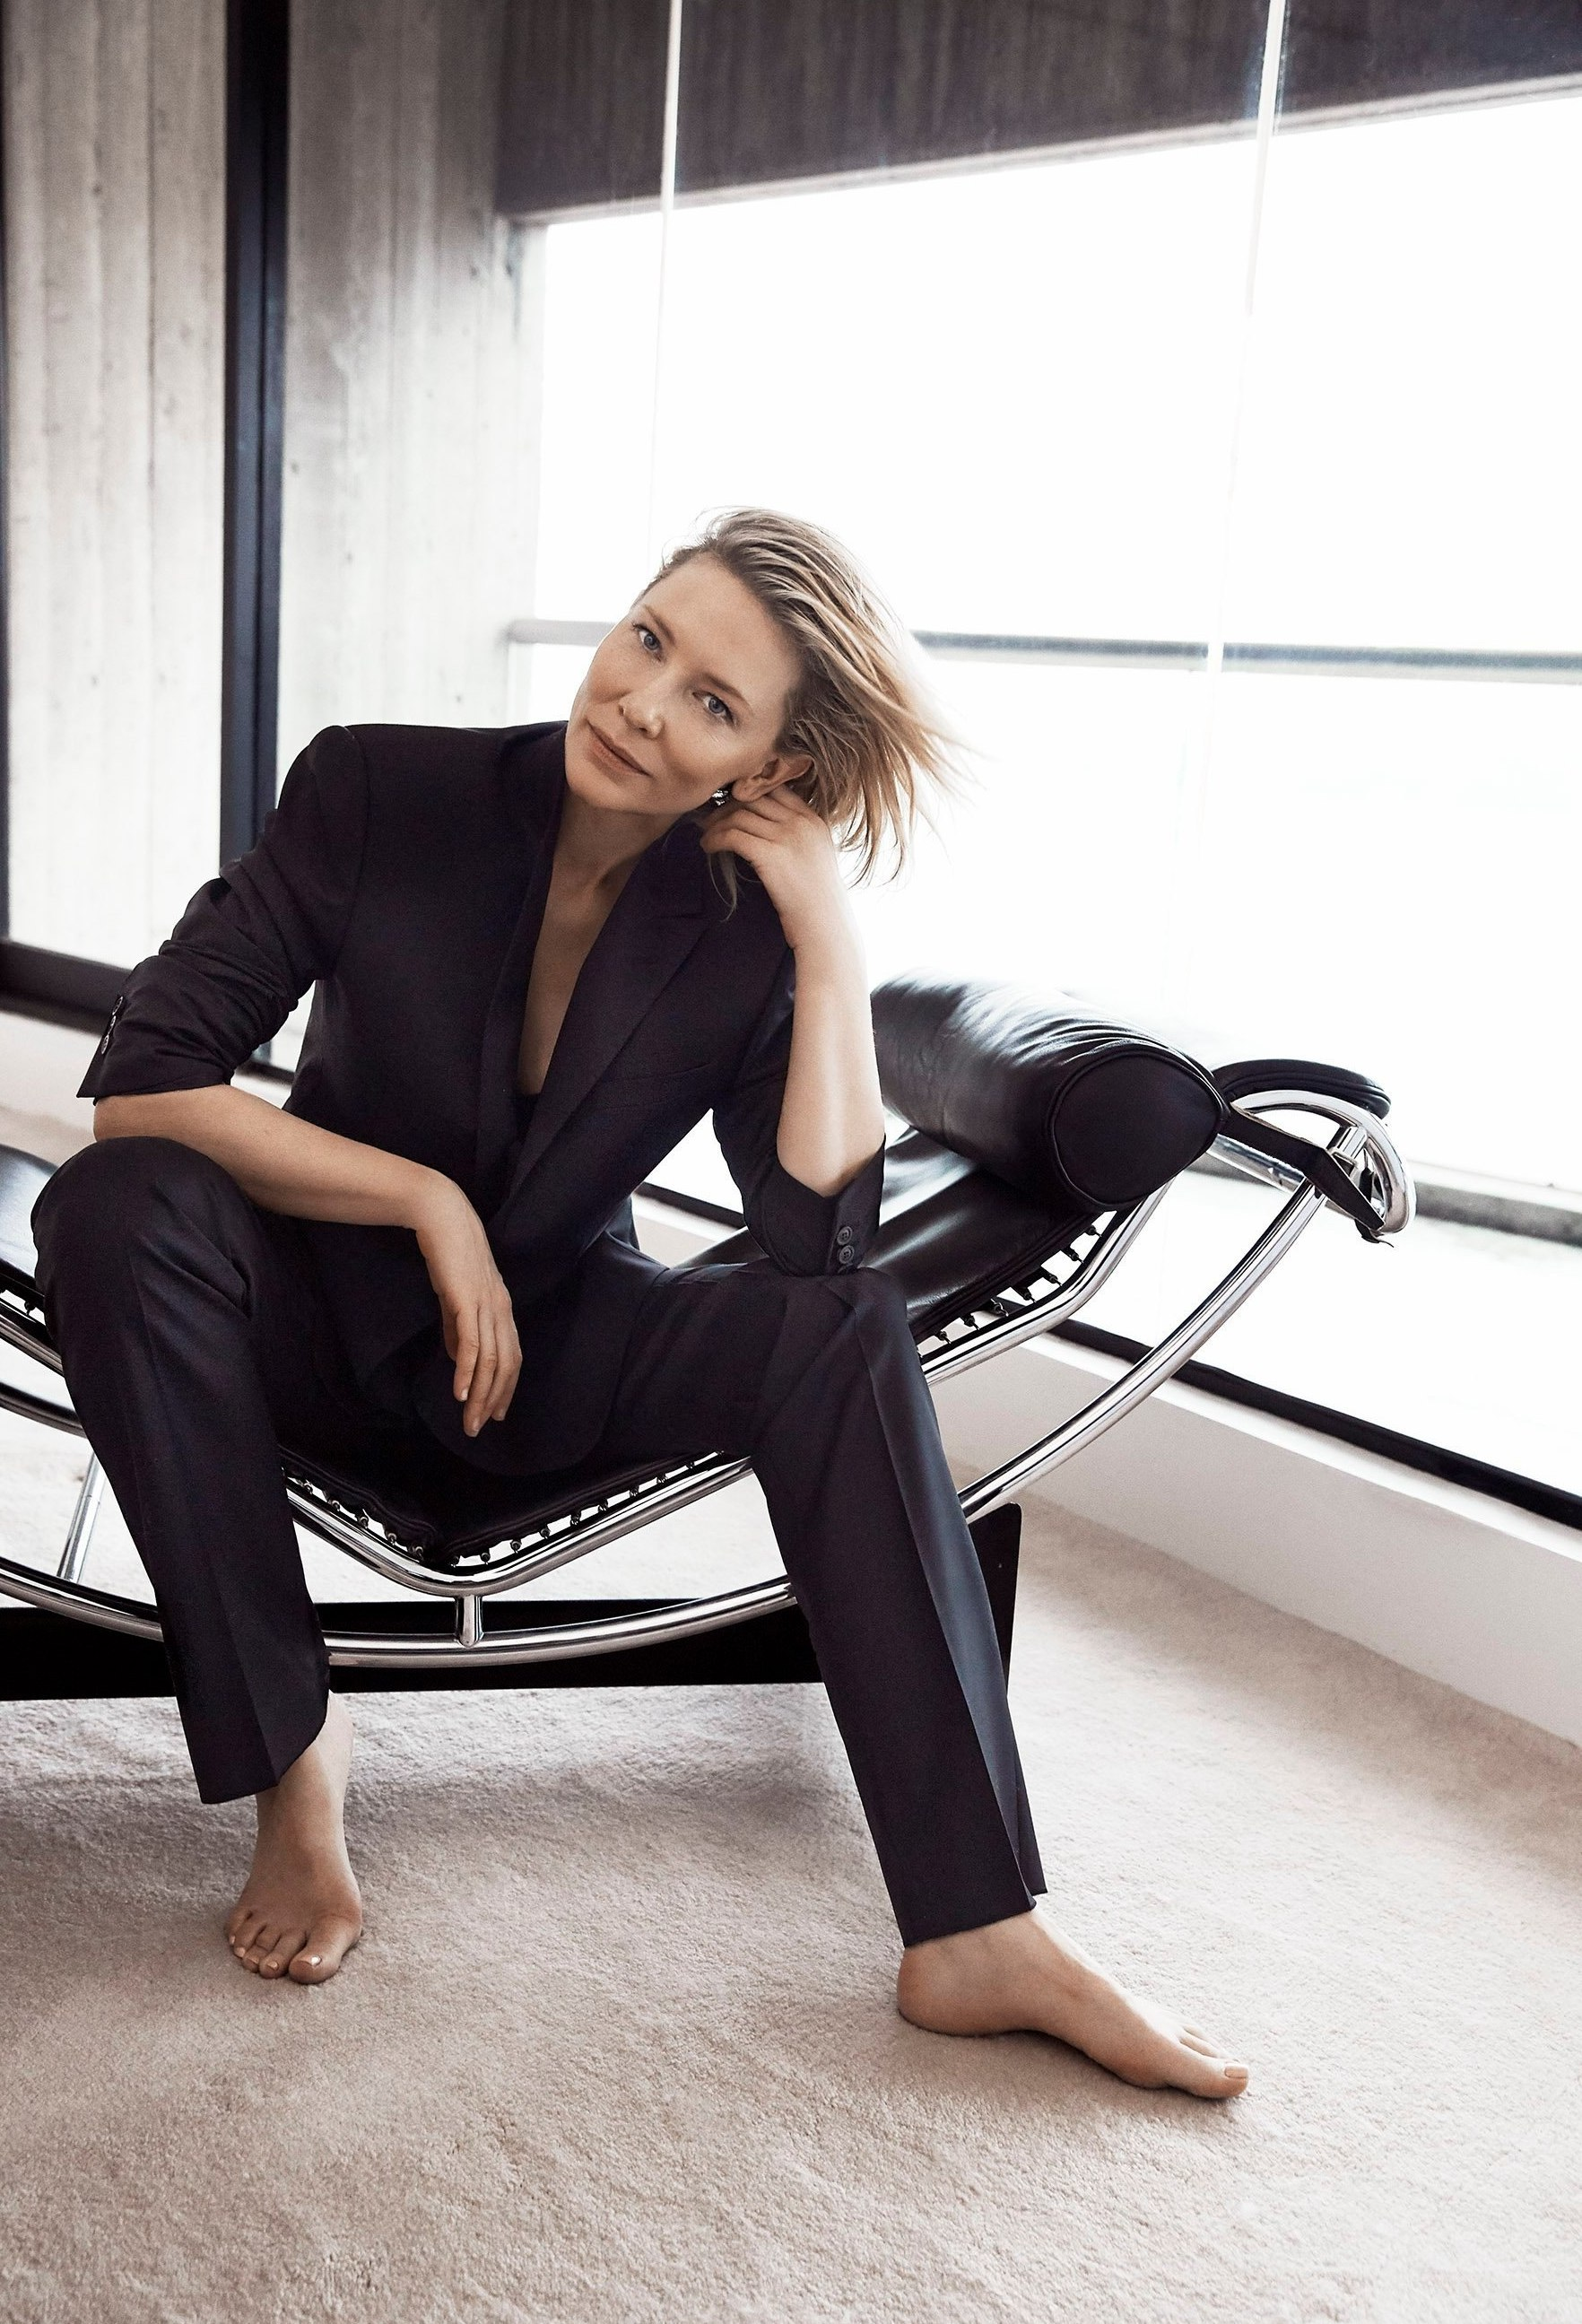 Feet Cate Blanchett nudes (11 photos), Topless